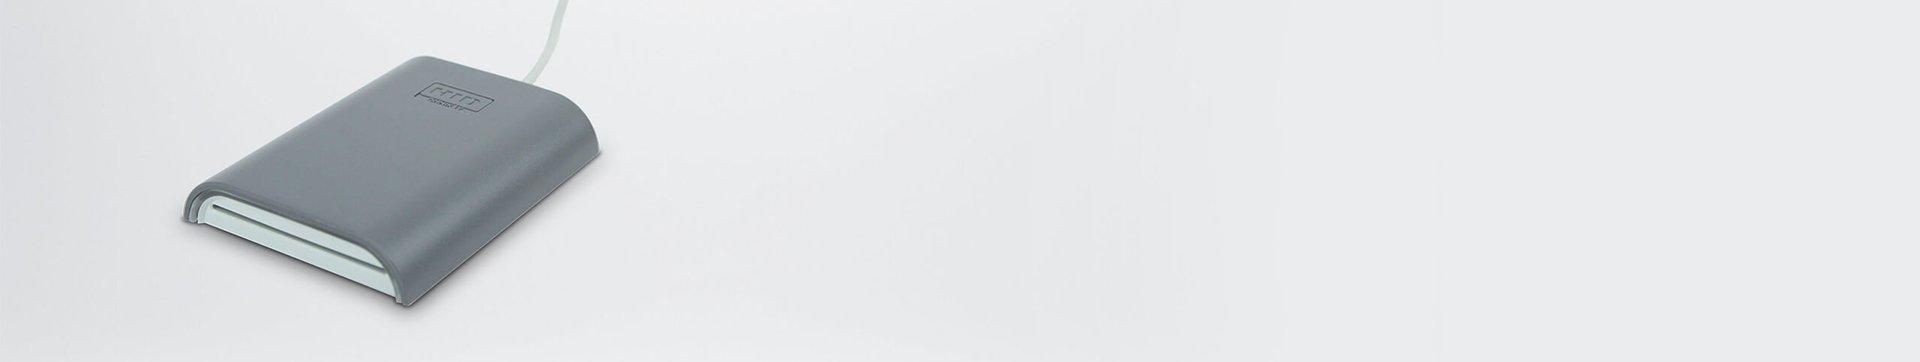 Desktop citaci kartica - Hid Omnikey 5421